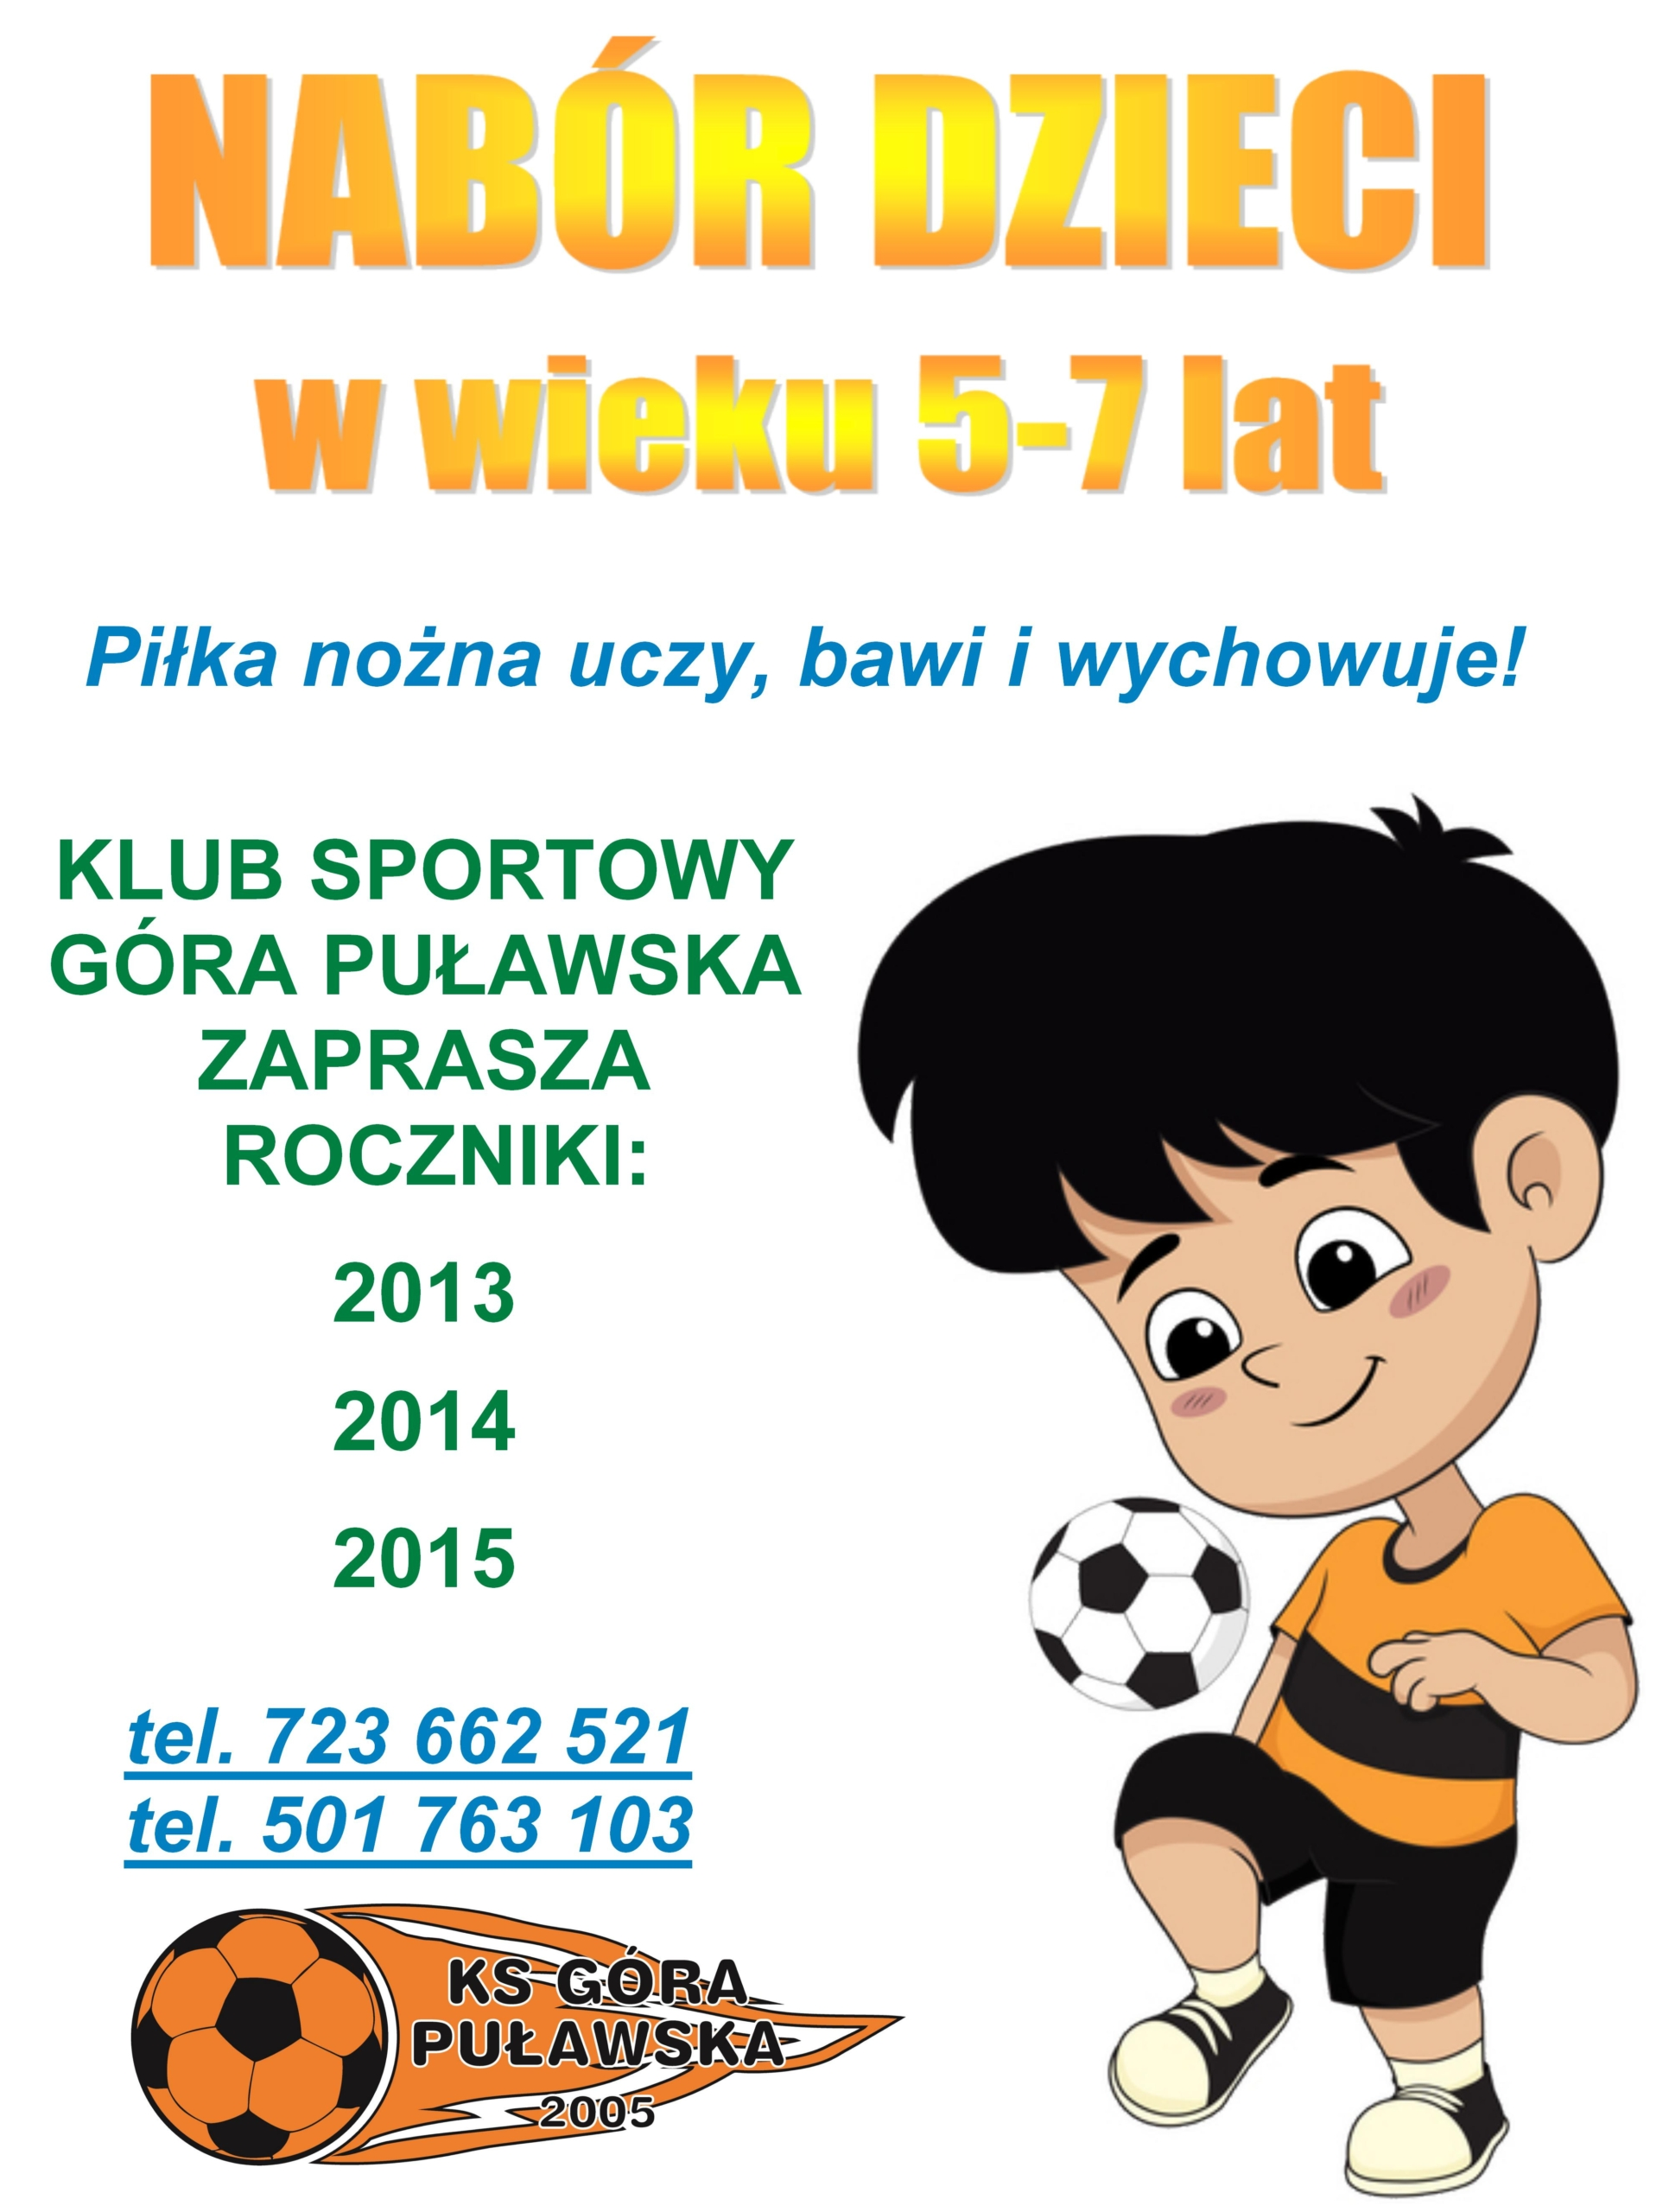 Zostań piłkarzem KS Góra Puławska!